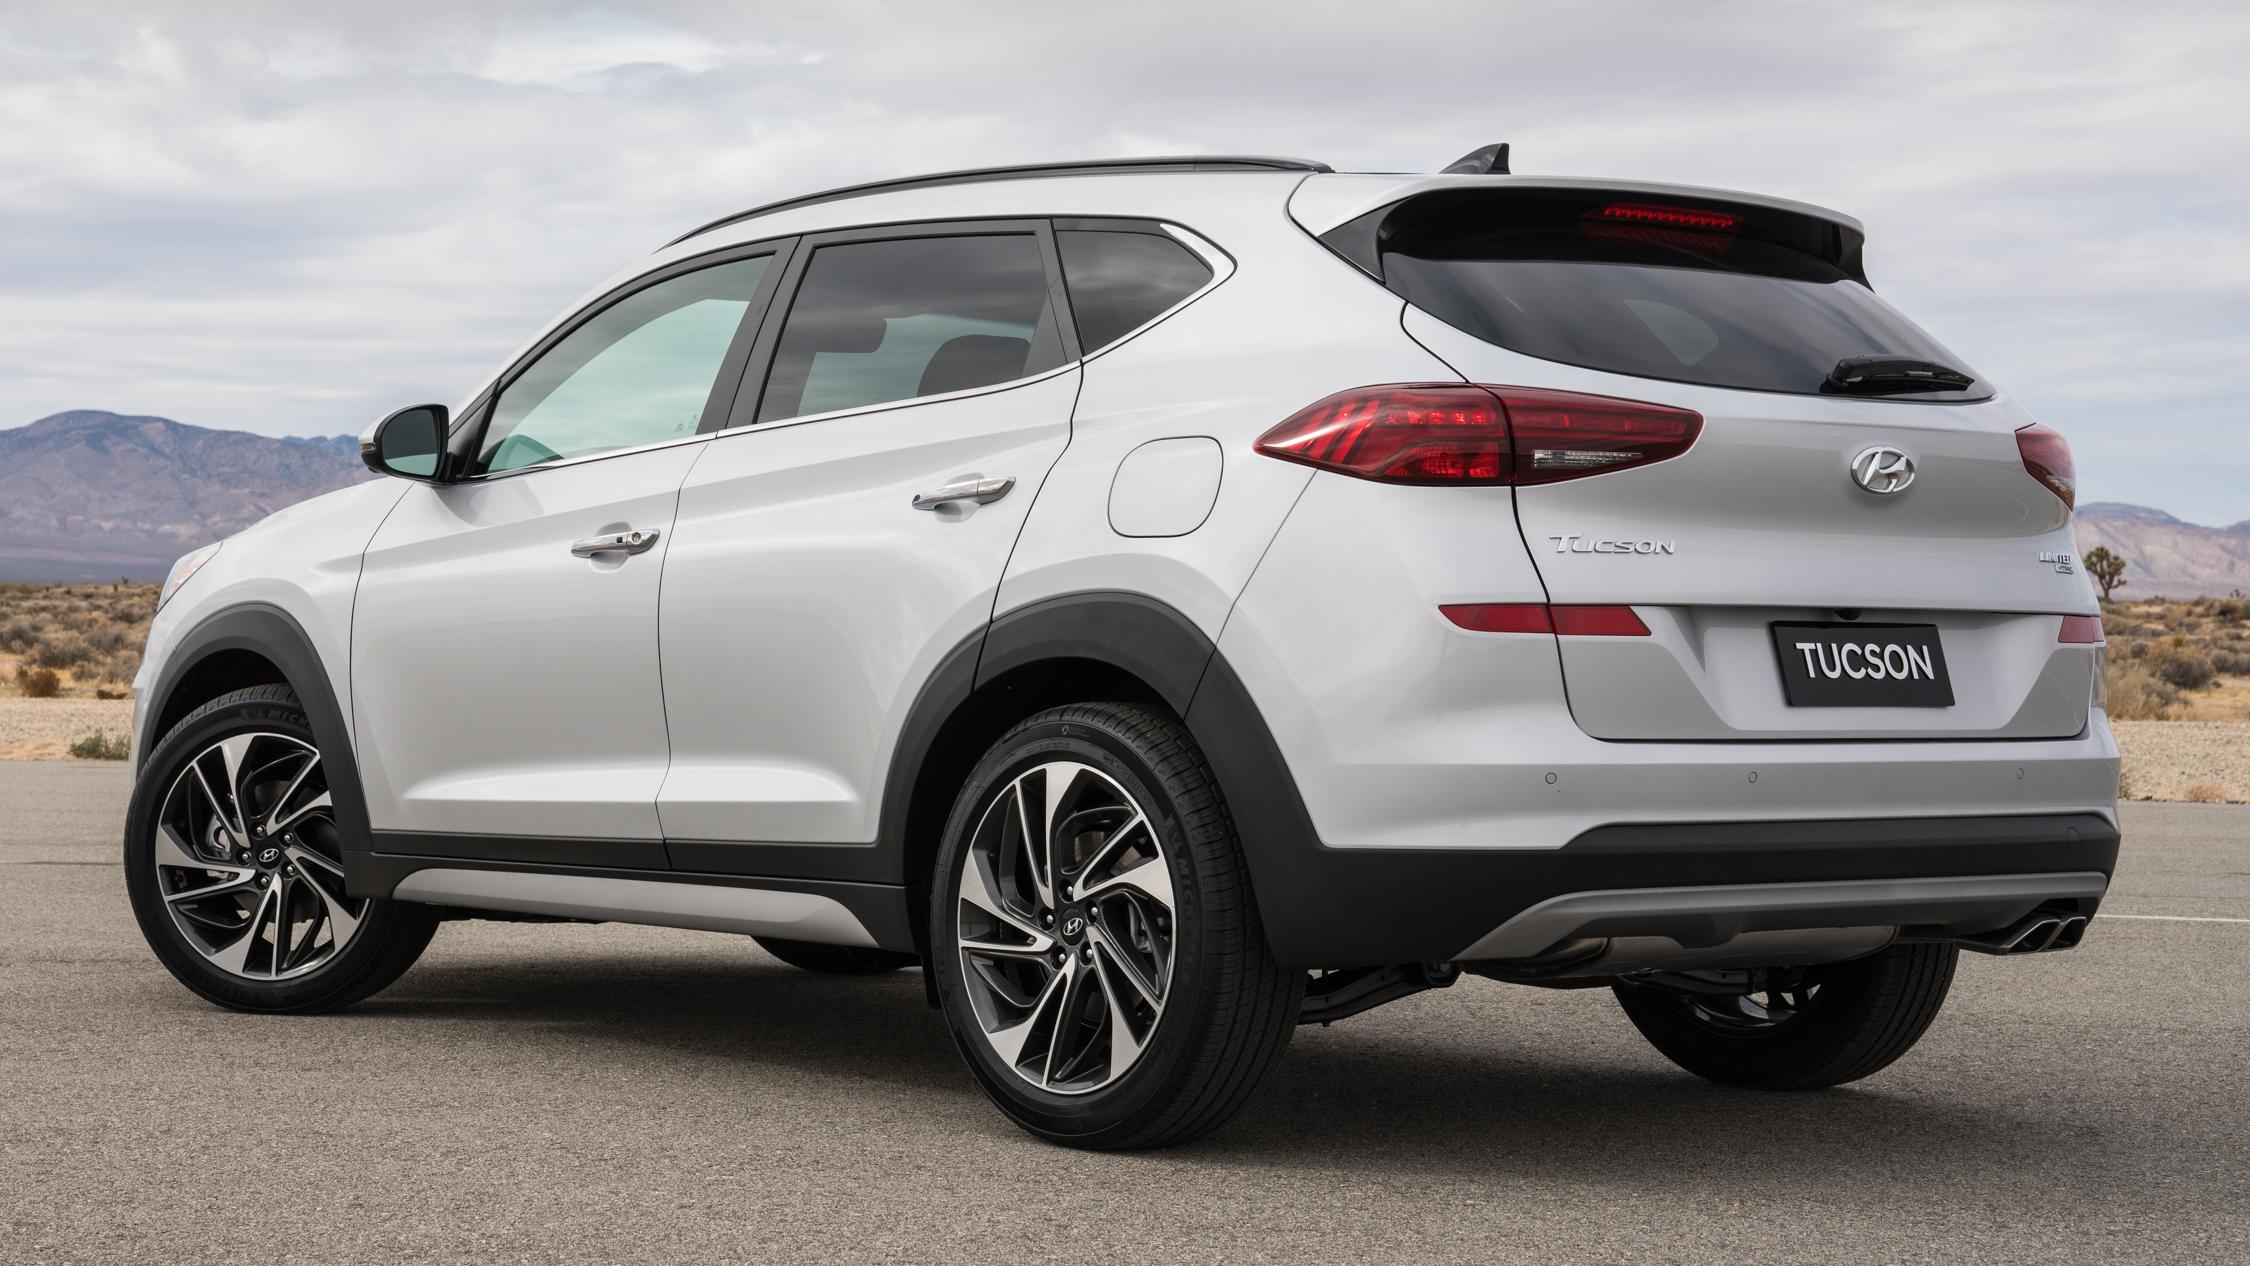 2019 Hyundai Tucson 小改款,美规版弃涡轮引擎及dct 2019 Hyundai Tucson